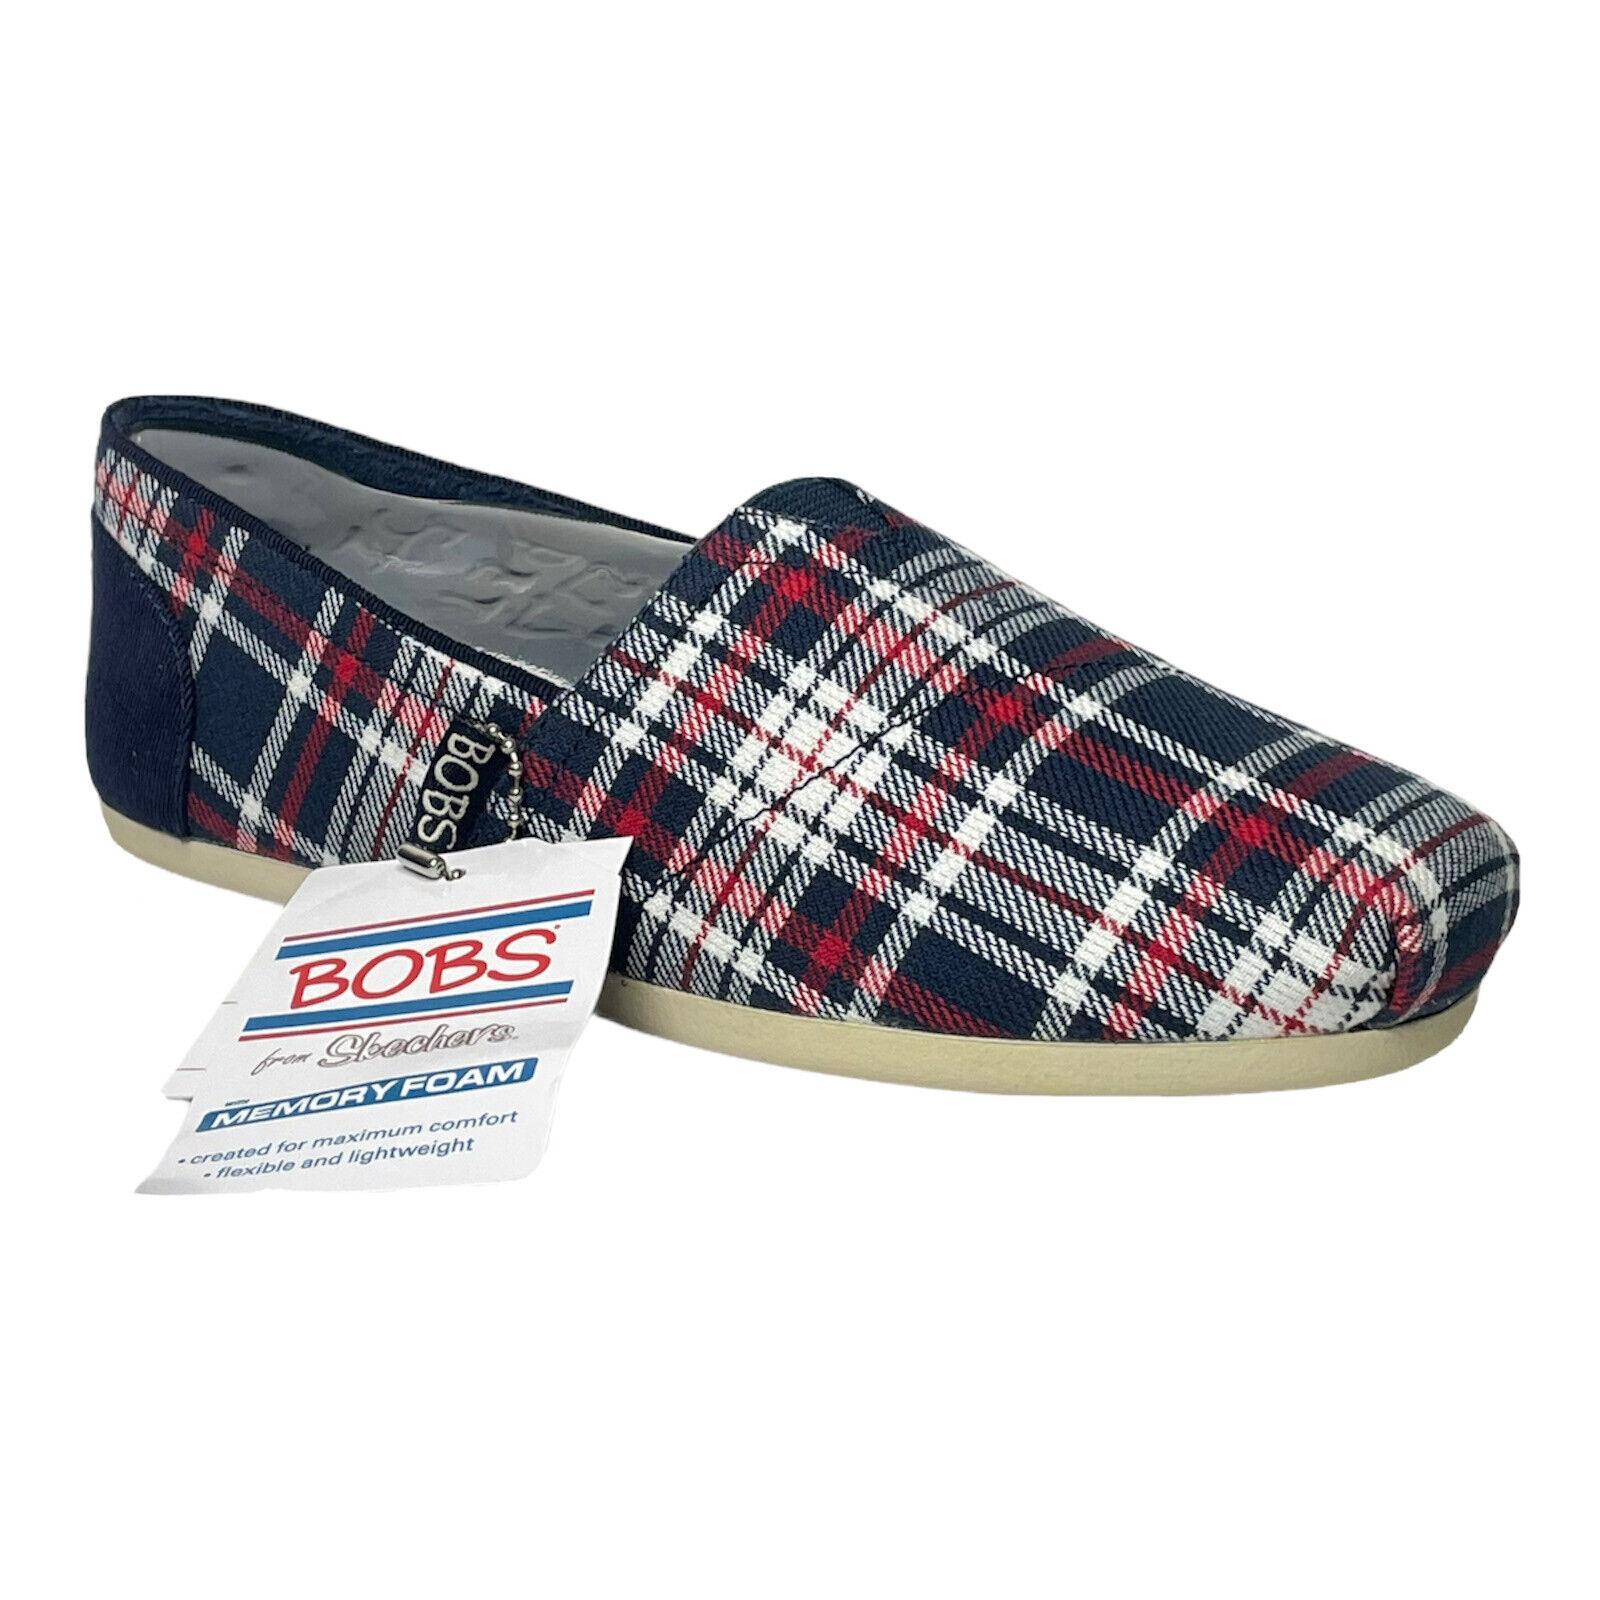 Skechers BOBS Women's Size 5.5 Bobs Plush Plaid Dash Slip-on 32655 Save The Dogs